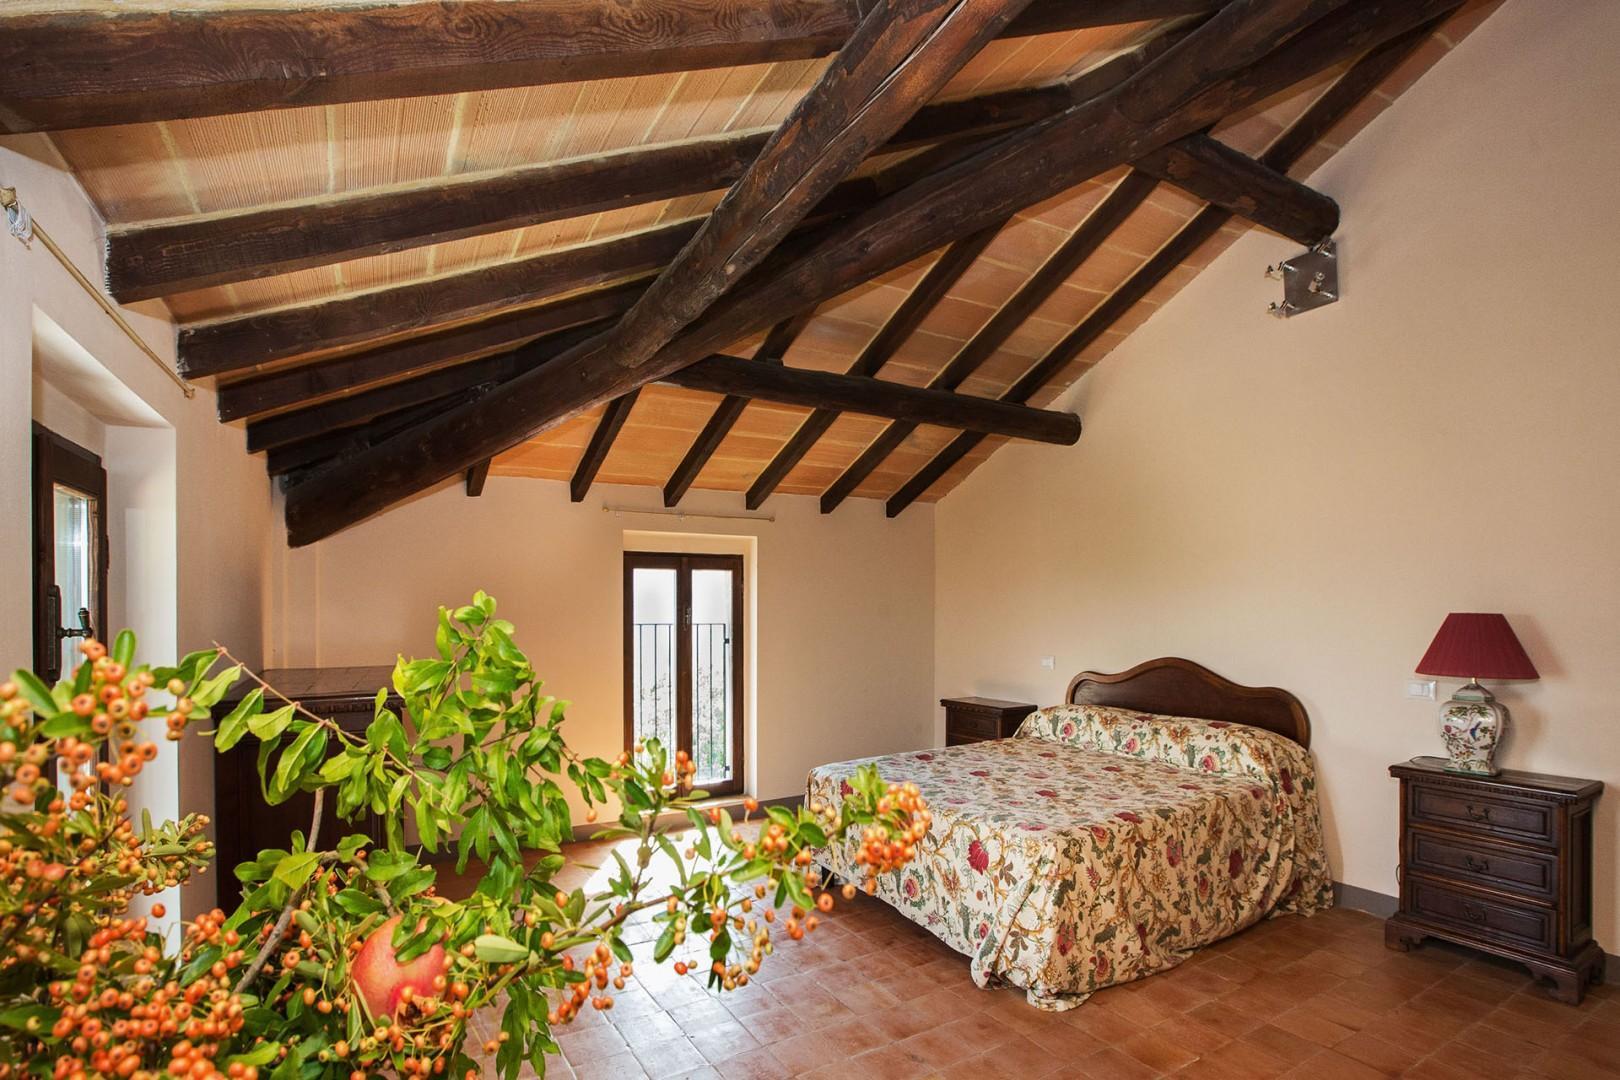 Beamed ceilings in bedroom 6 and 7.